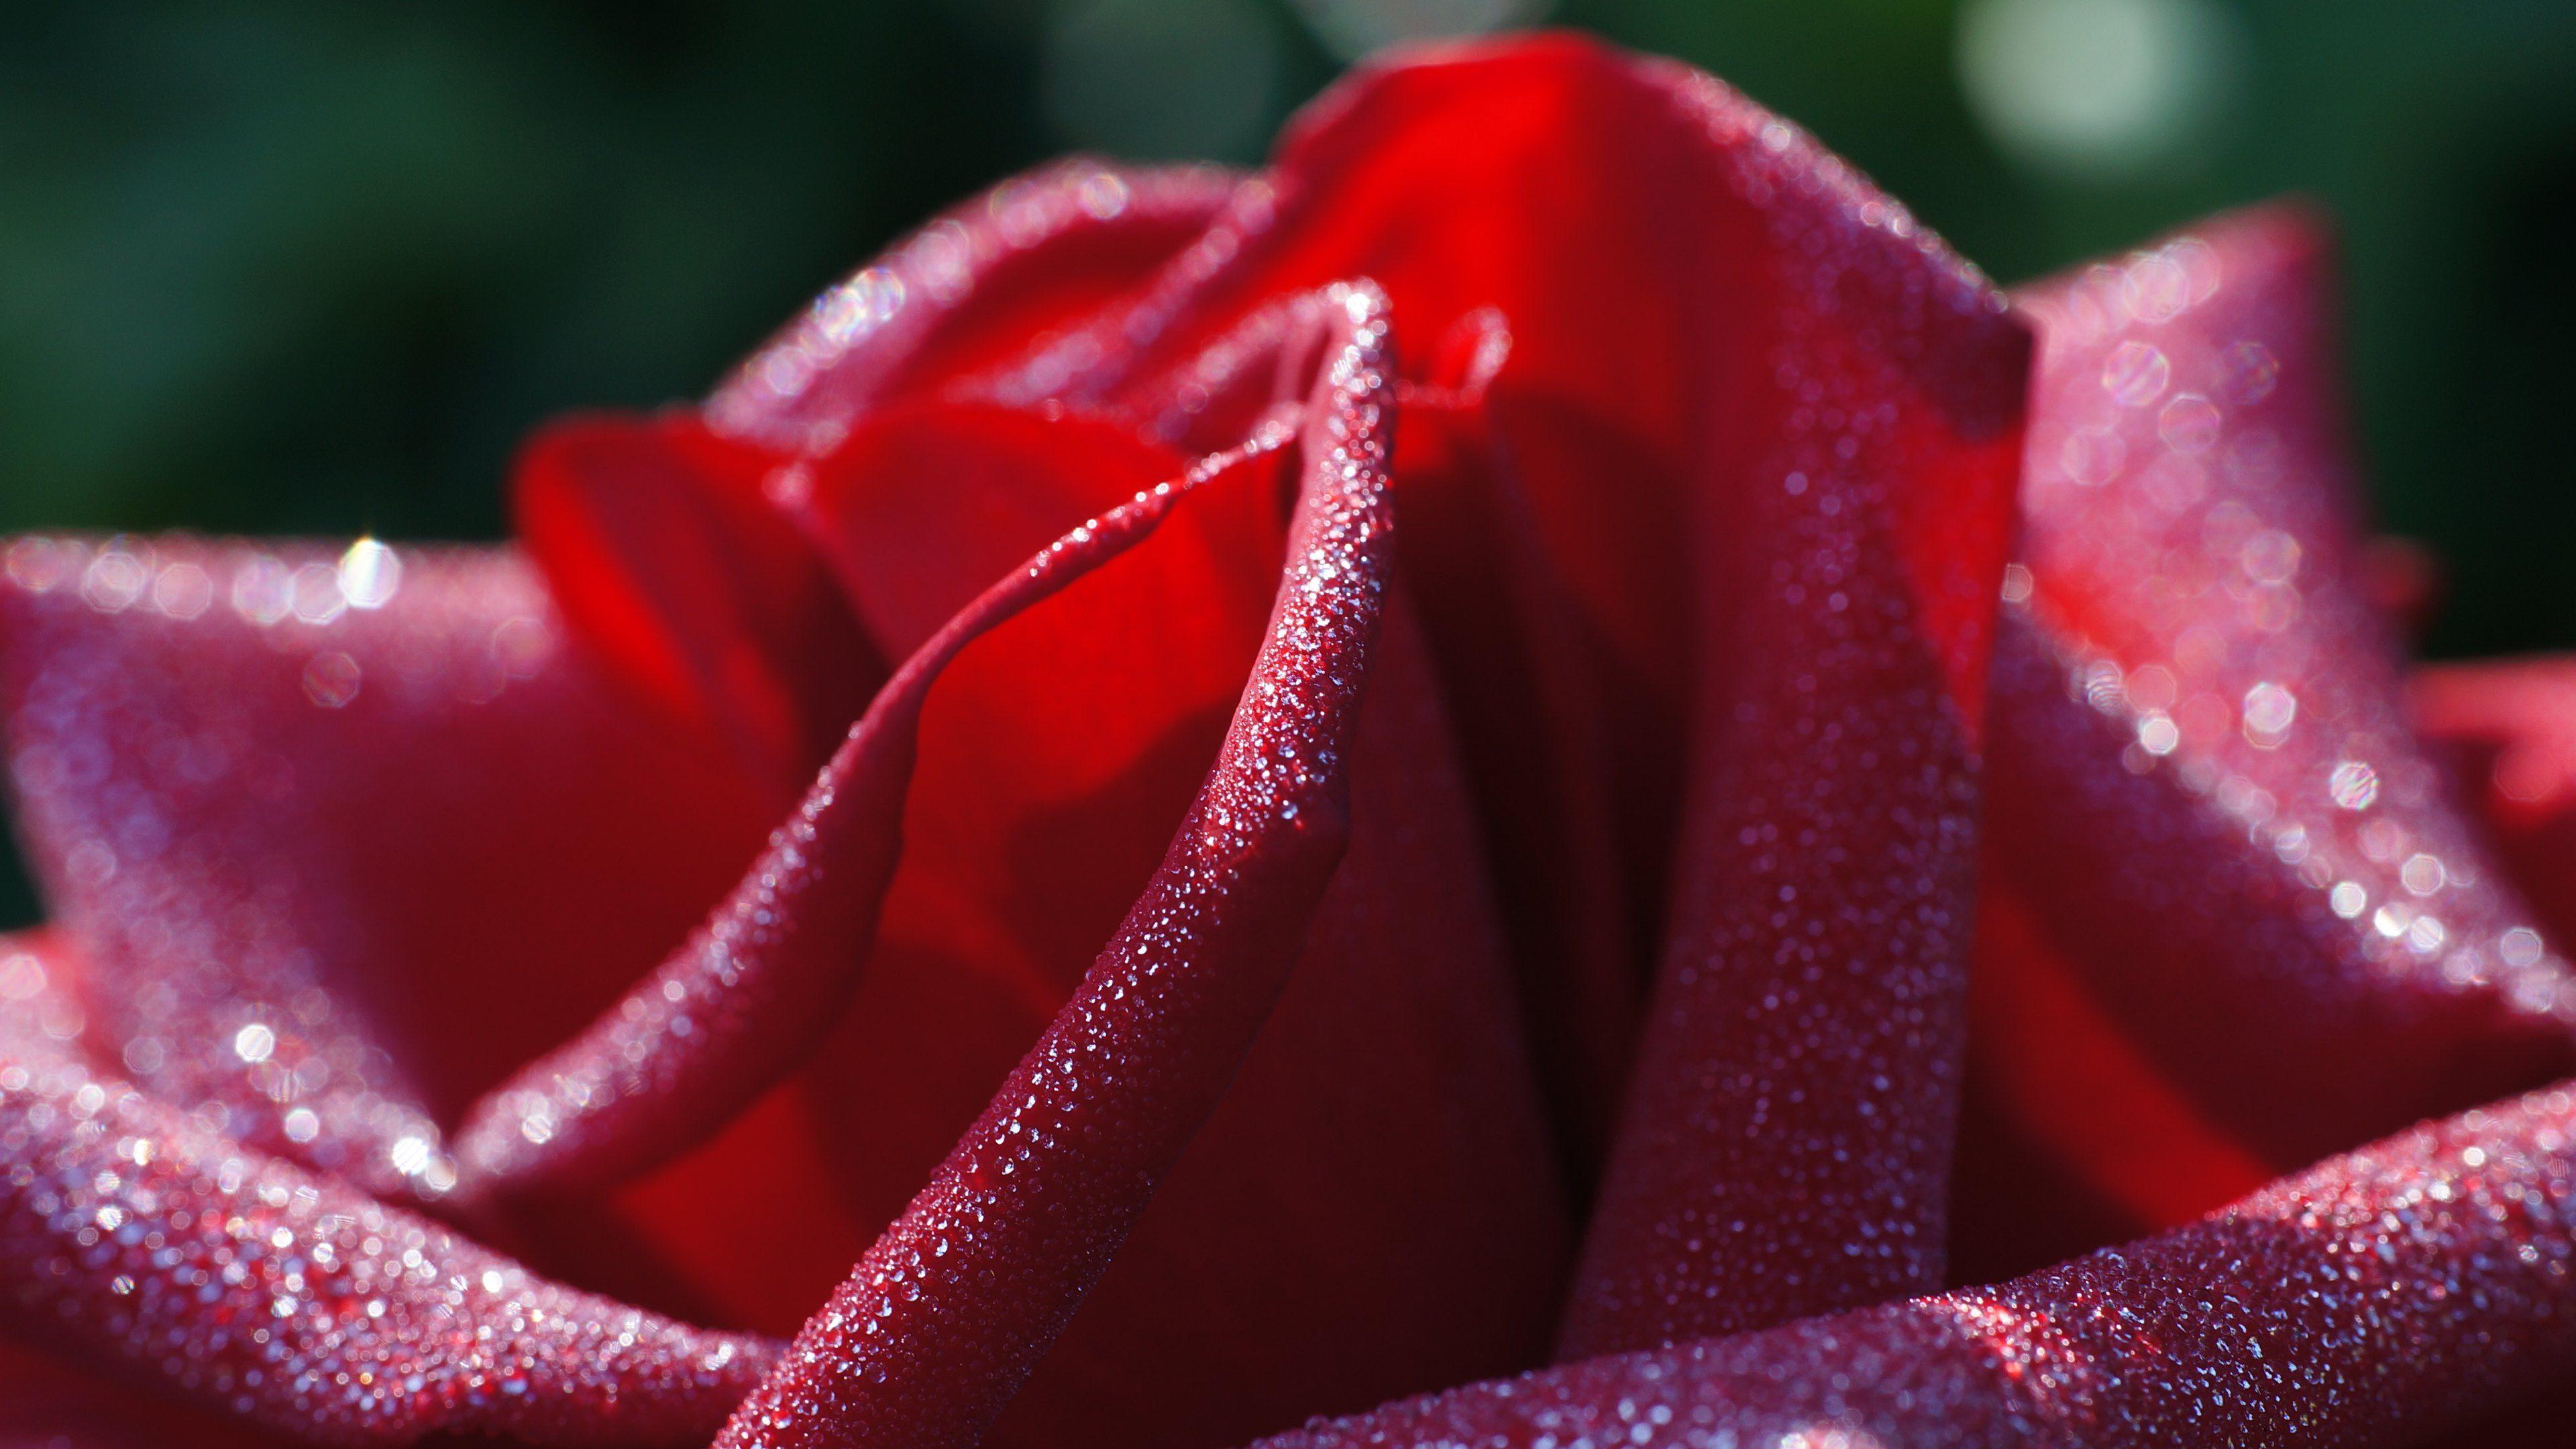 Hot Love Macro Flowers Roses Red Flower Wallpaper Flower Wallpaper Macro Flower